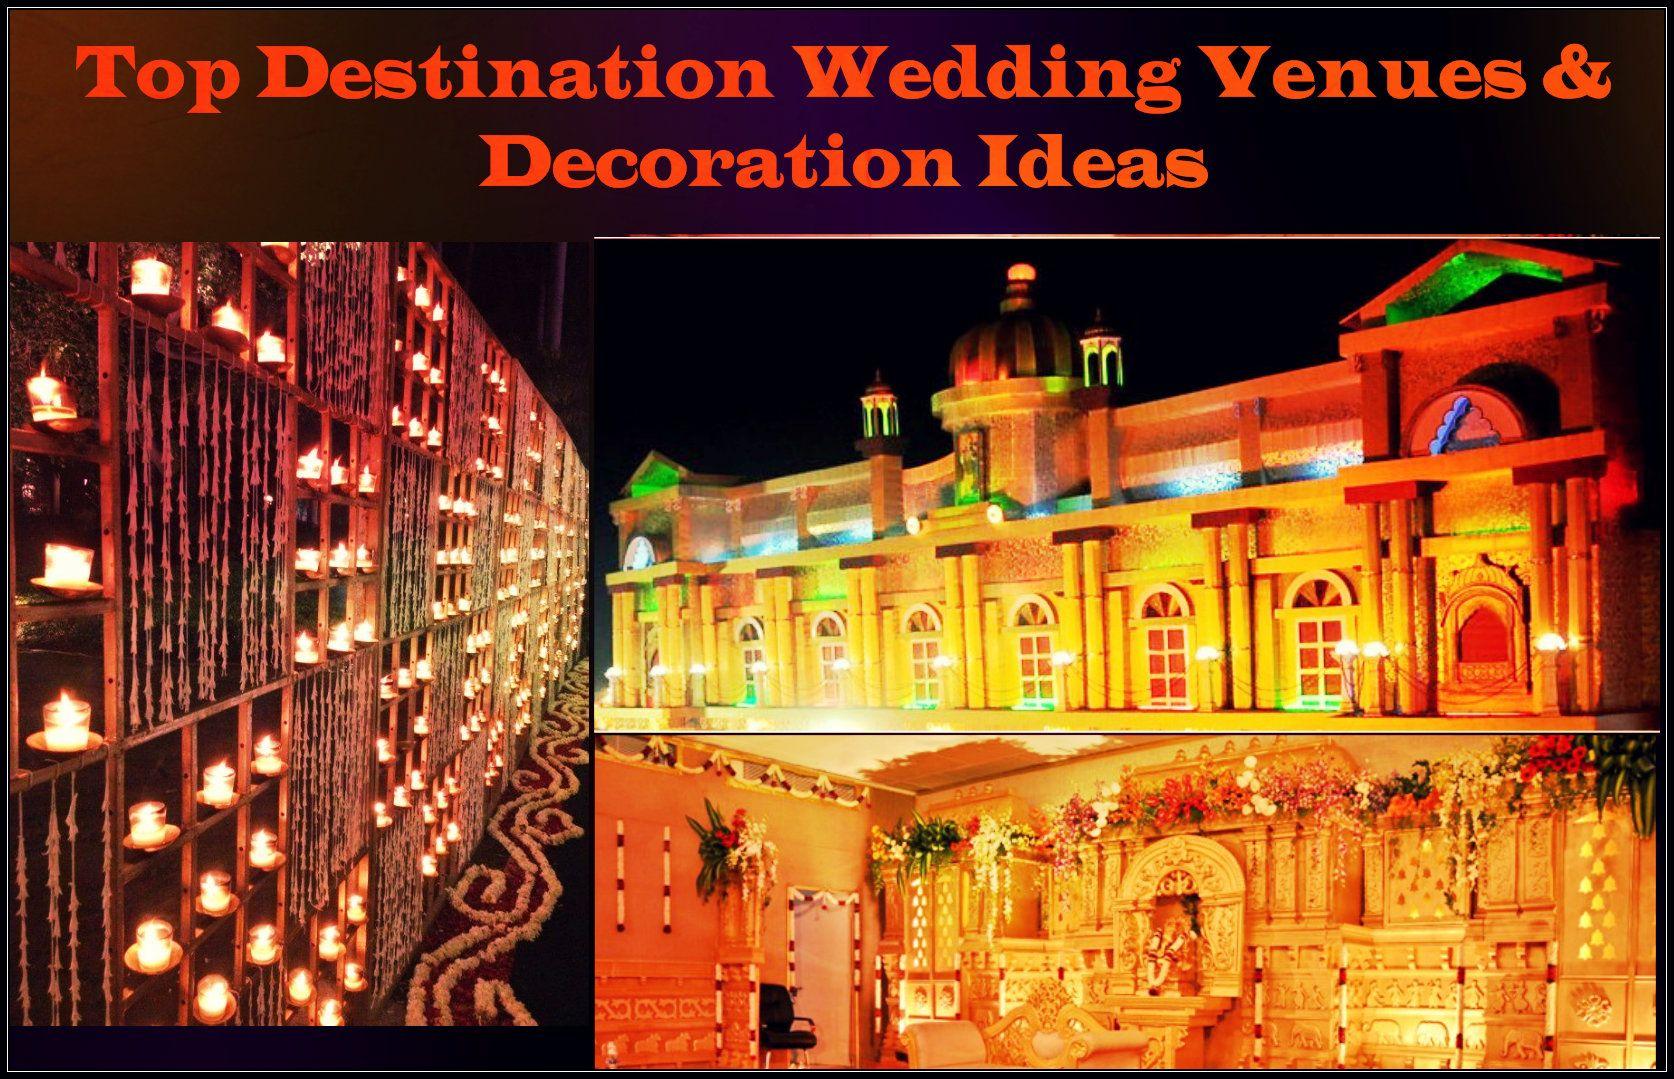 Top Destination Wedding Venues & Decoration Ideas With